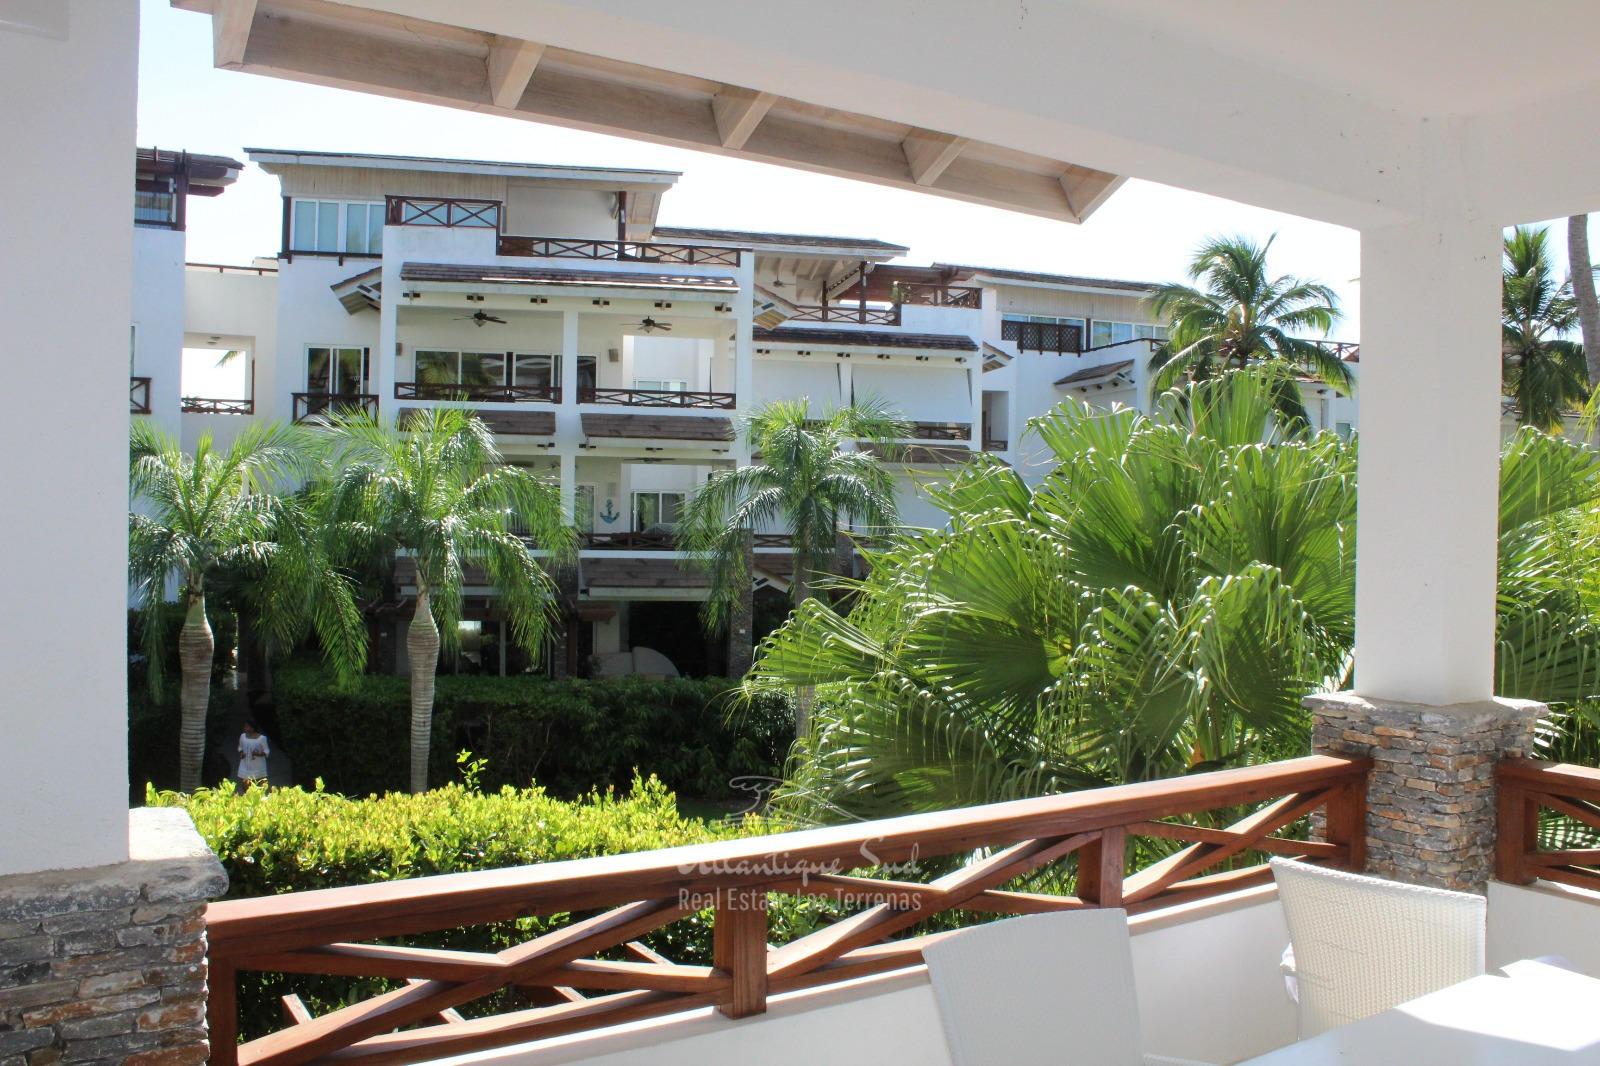 Apartments near the beach real estate las terrenas dominican republic12.jpg